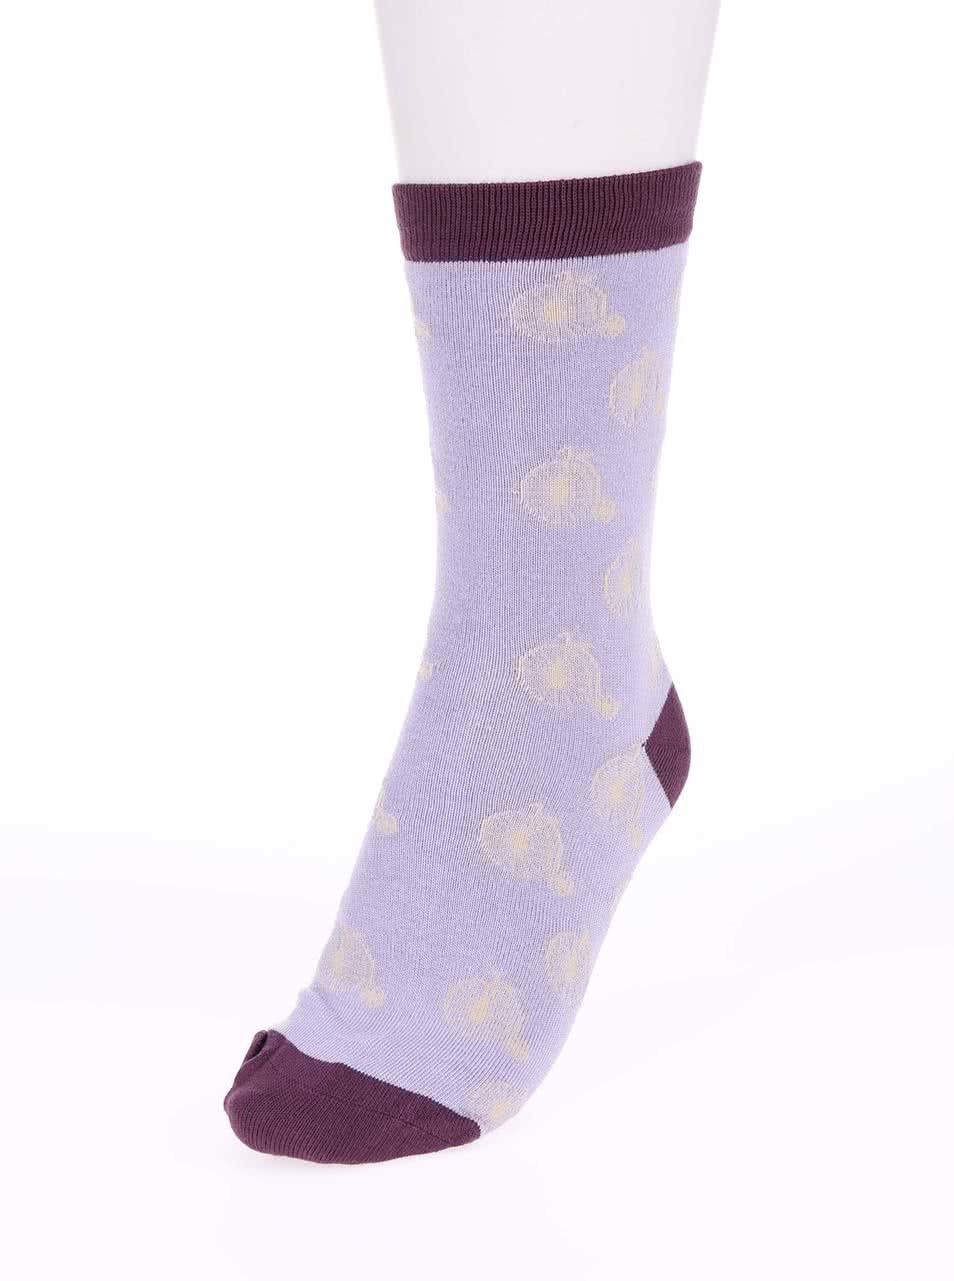 eb17c92b775 Fialové dámske bambusové ponožky Braintree Penny Farthing ...